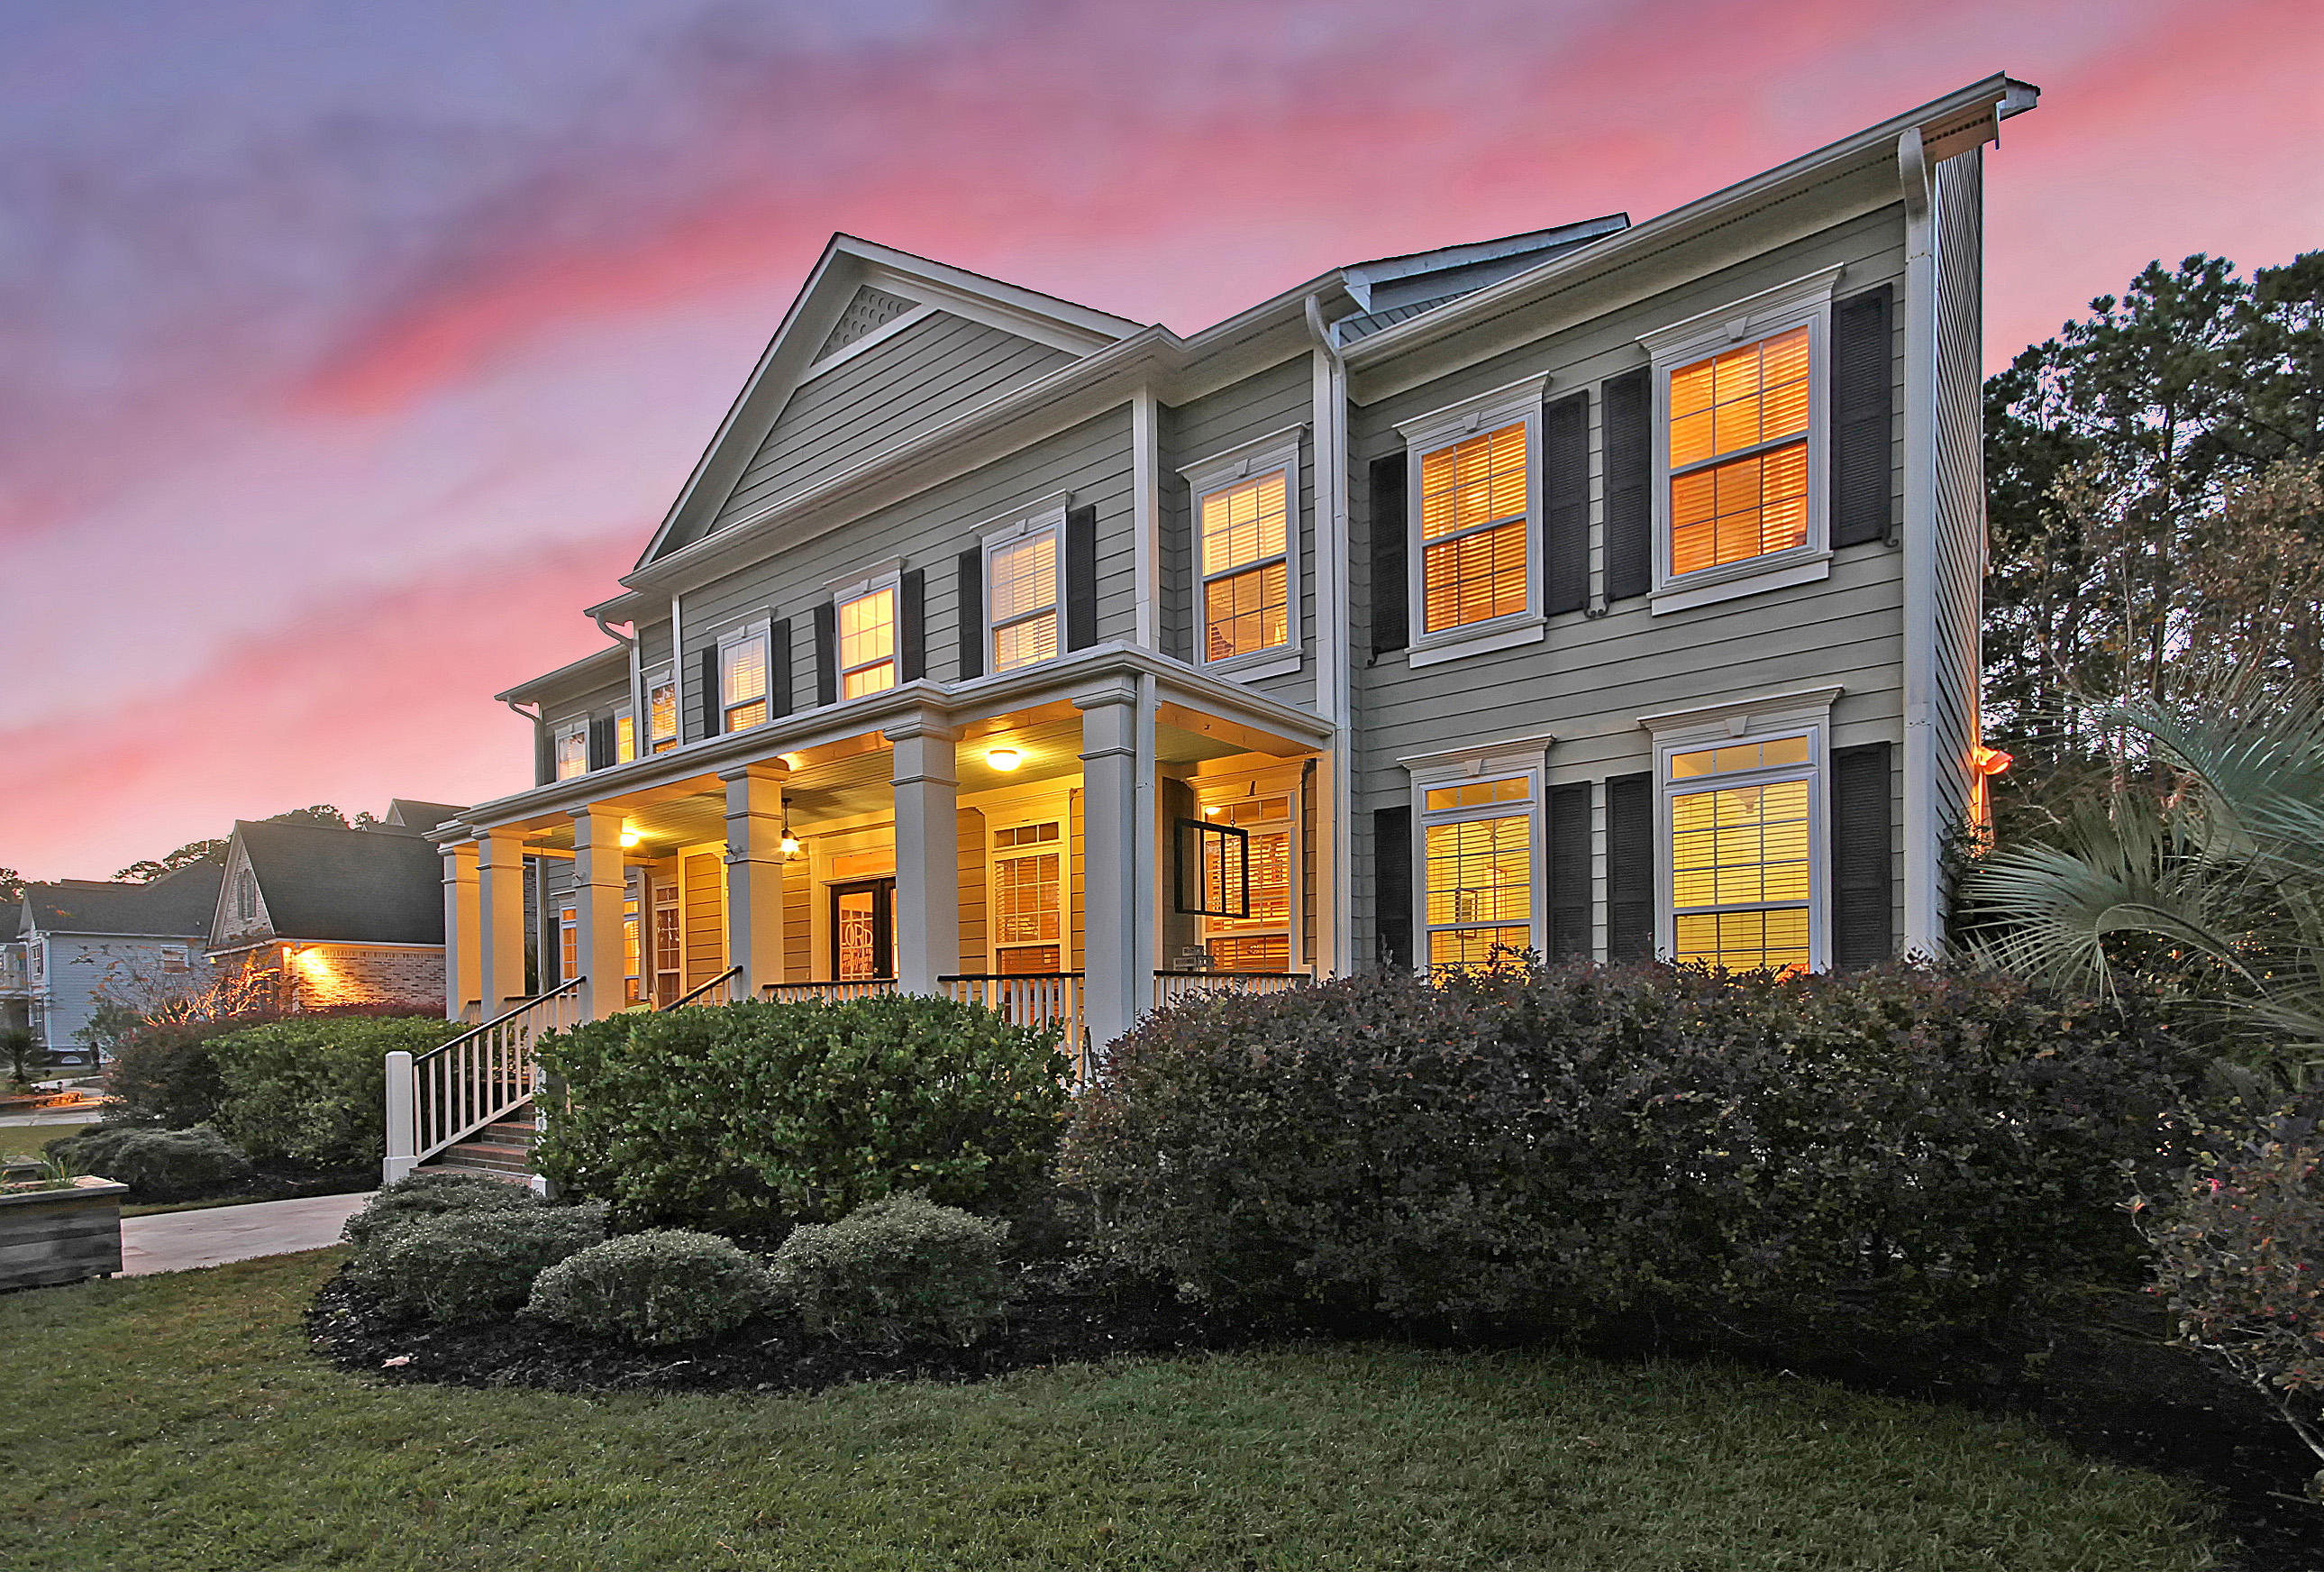 Dunes West Homes For Sale - 2449 Darts Cove, Mount Pleasant, SC - 9